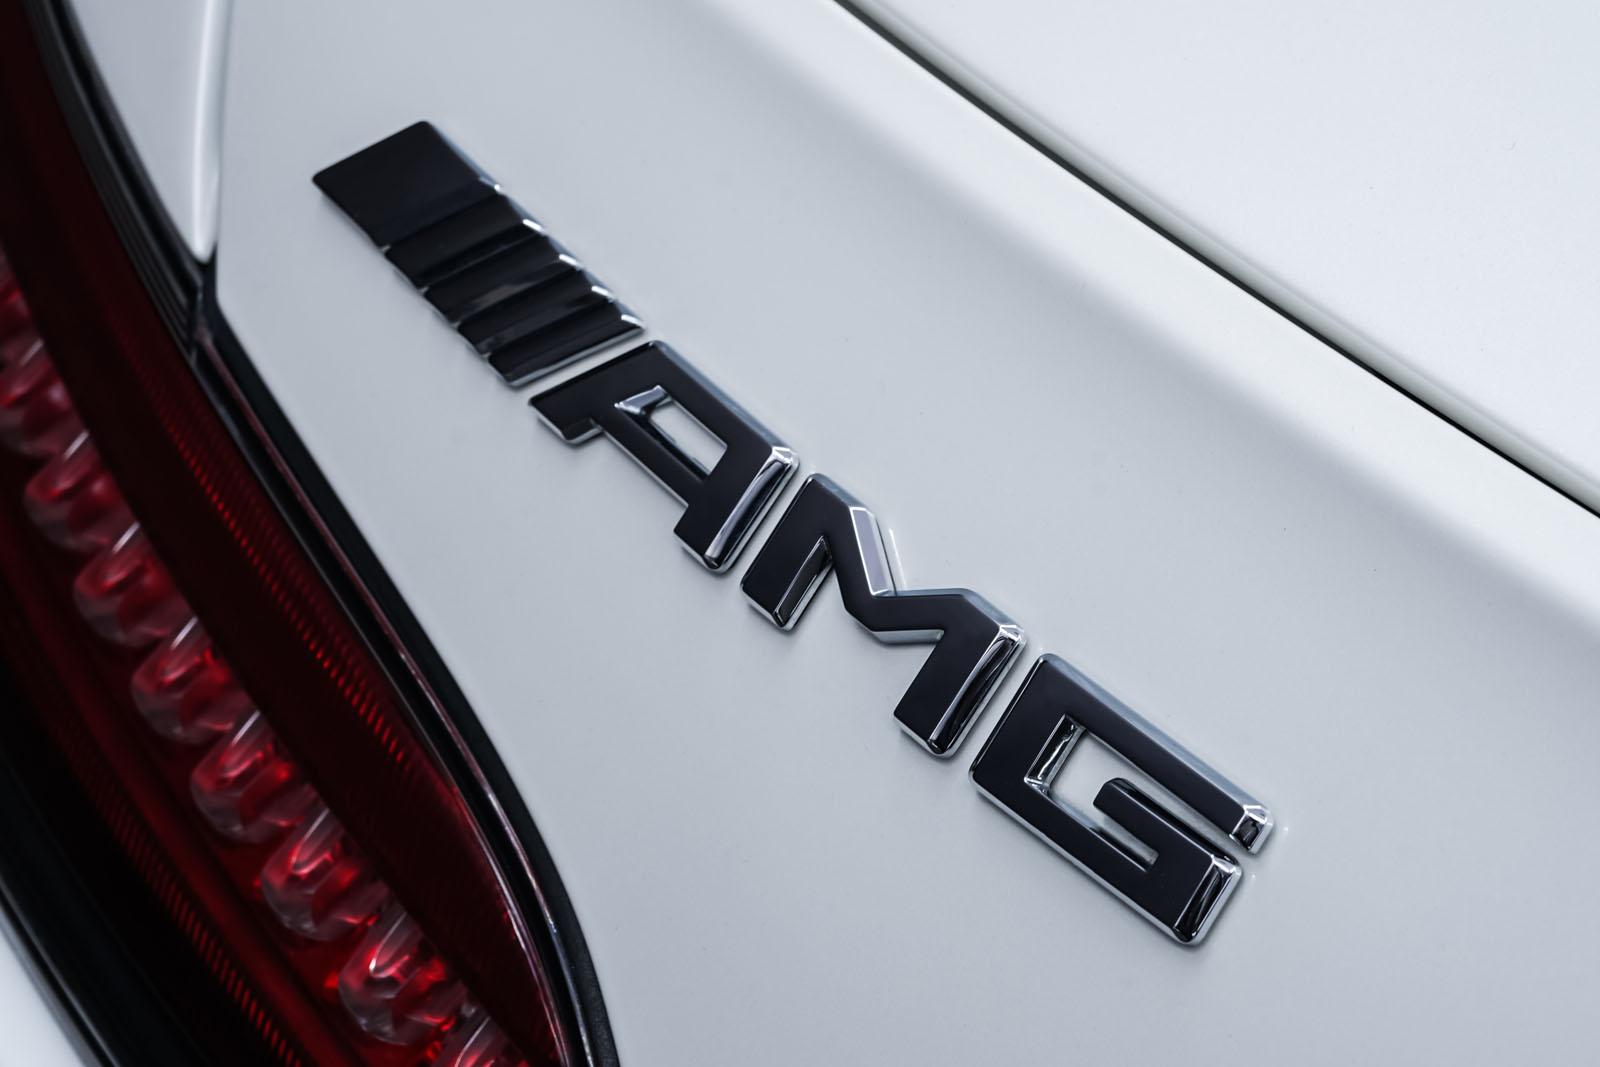 11Mercedes_Benz_AMG_GT_Roadster_Weiss_Schwarz_MB-9710_25_w